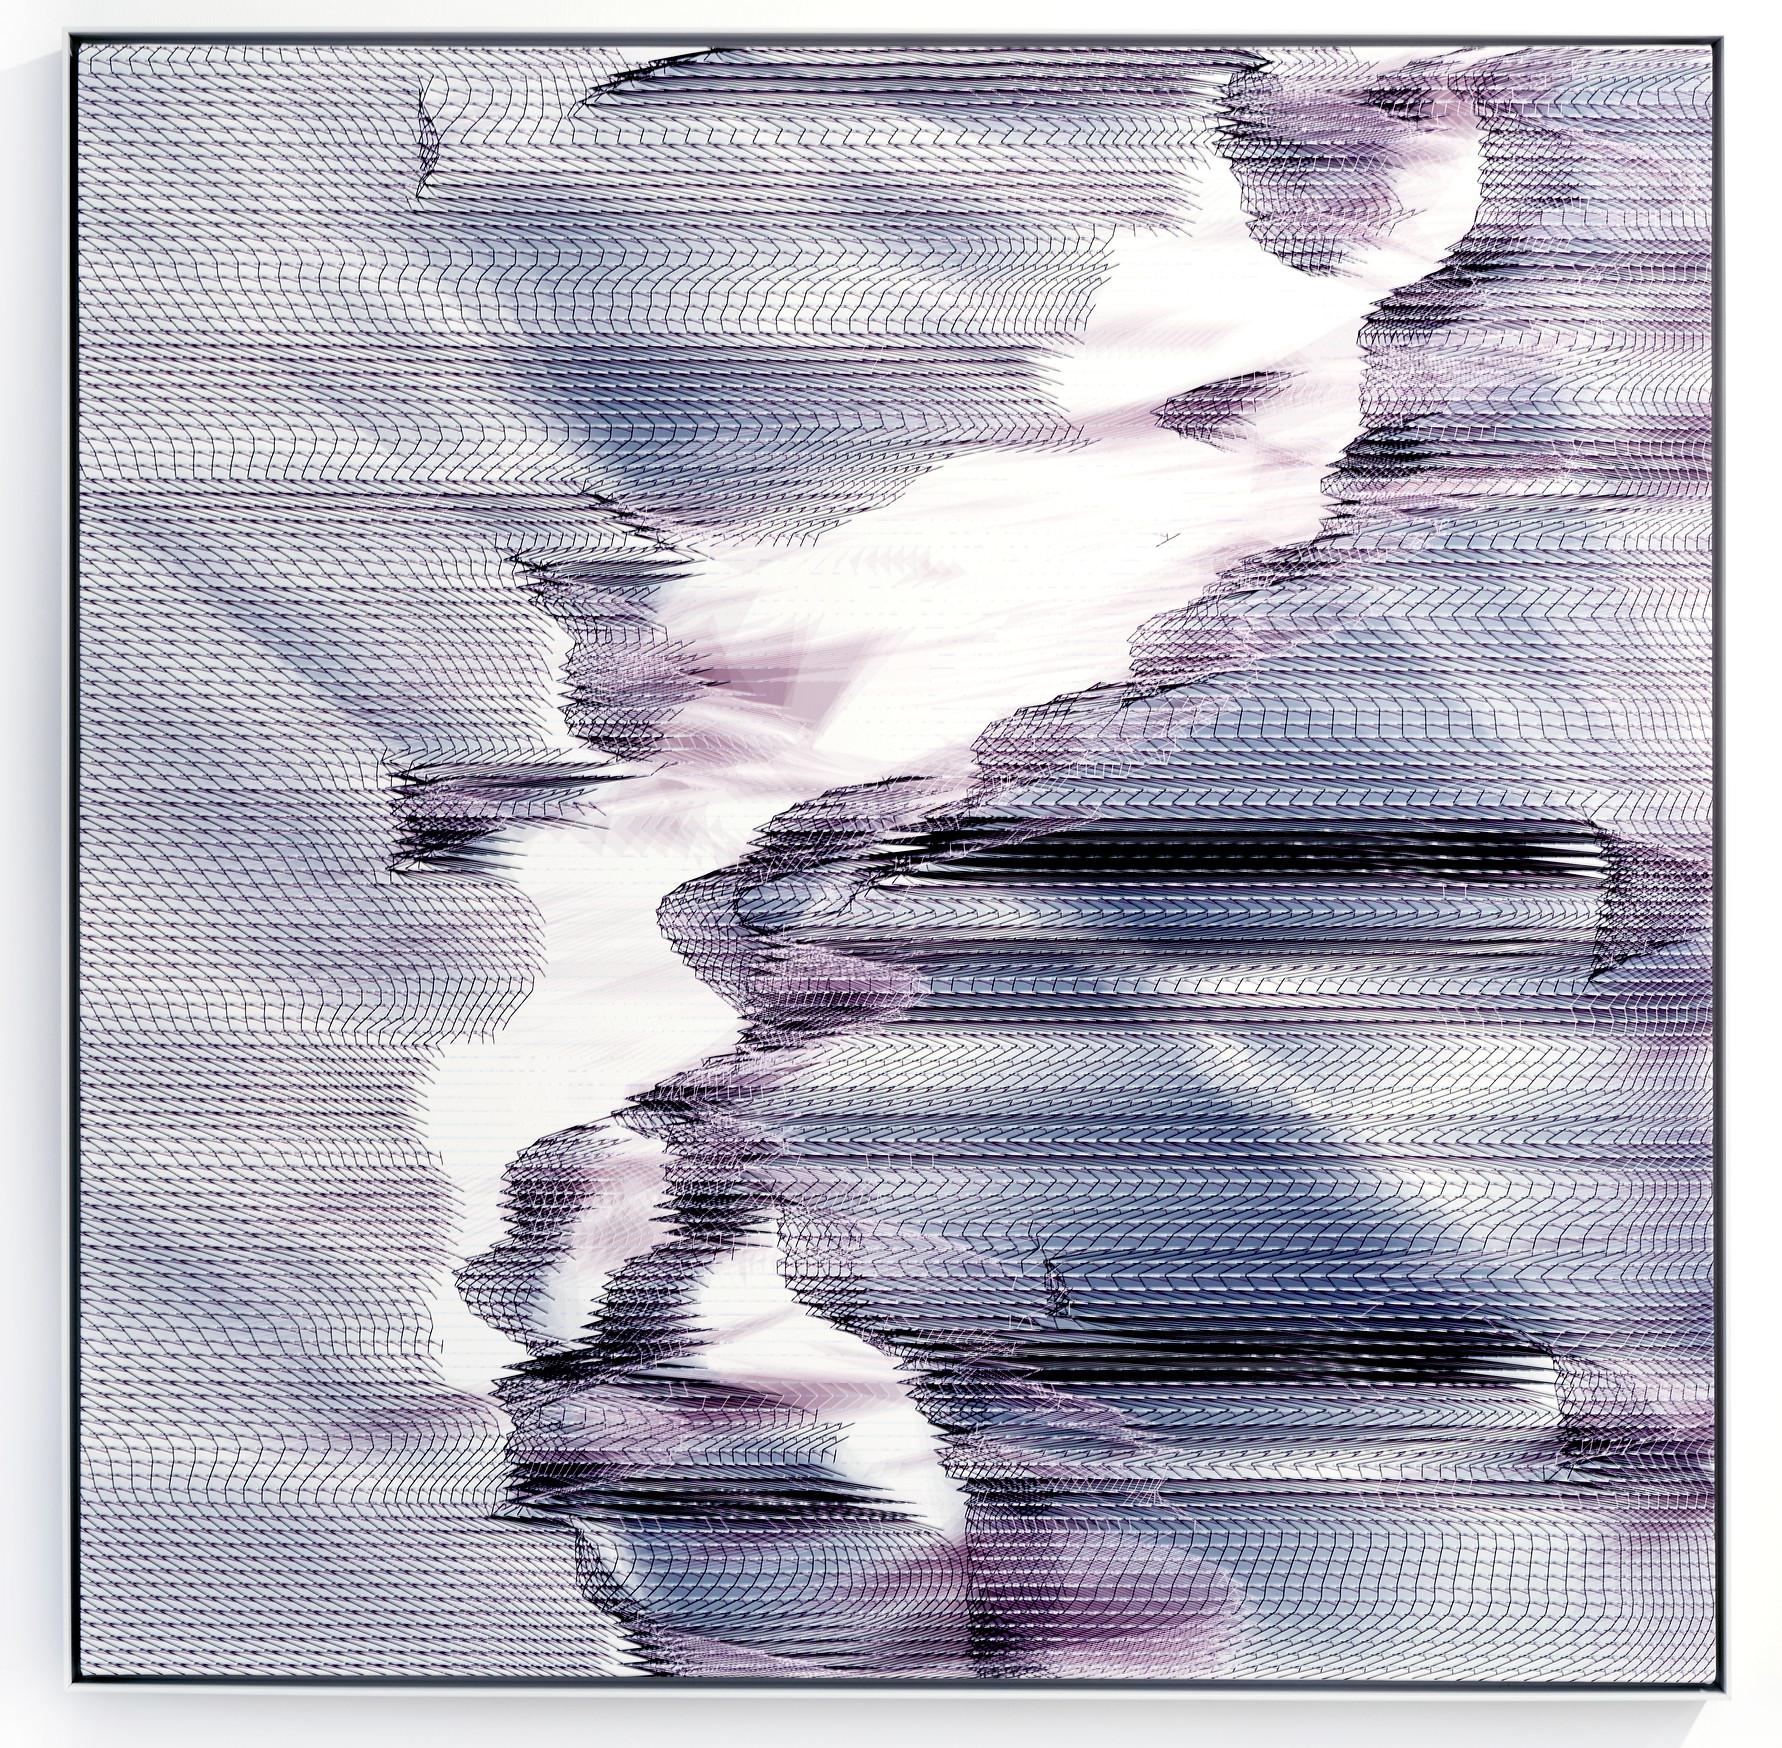 "<img src=""38_Orig_QUAKES 39 a_96x96_Perez Reiter_e"" alt=""the tectonic plates movement thousands of lines flow break rip stretch"">"